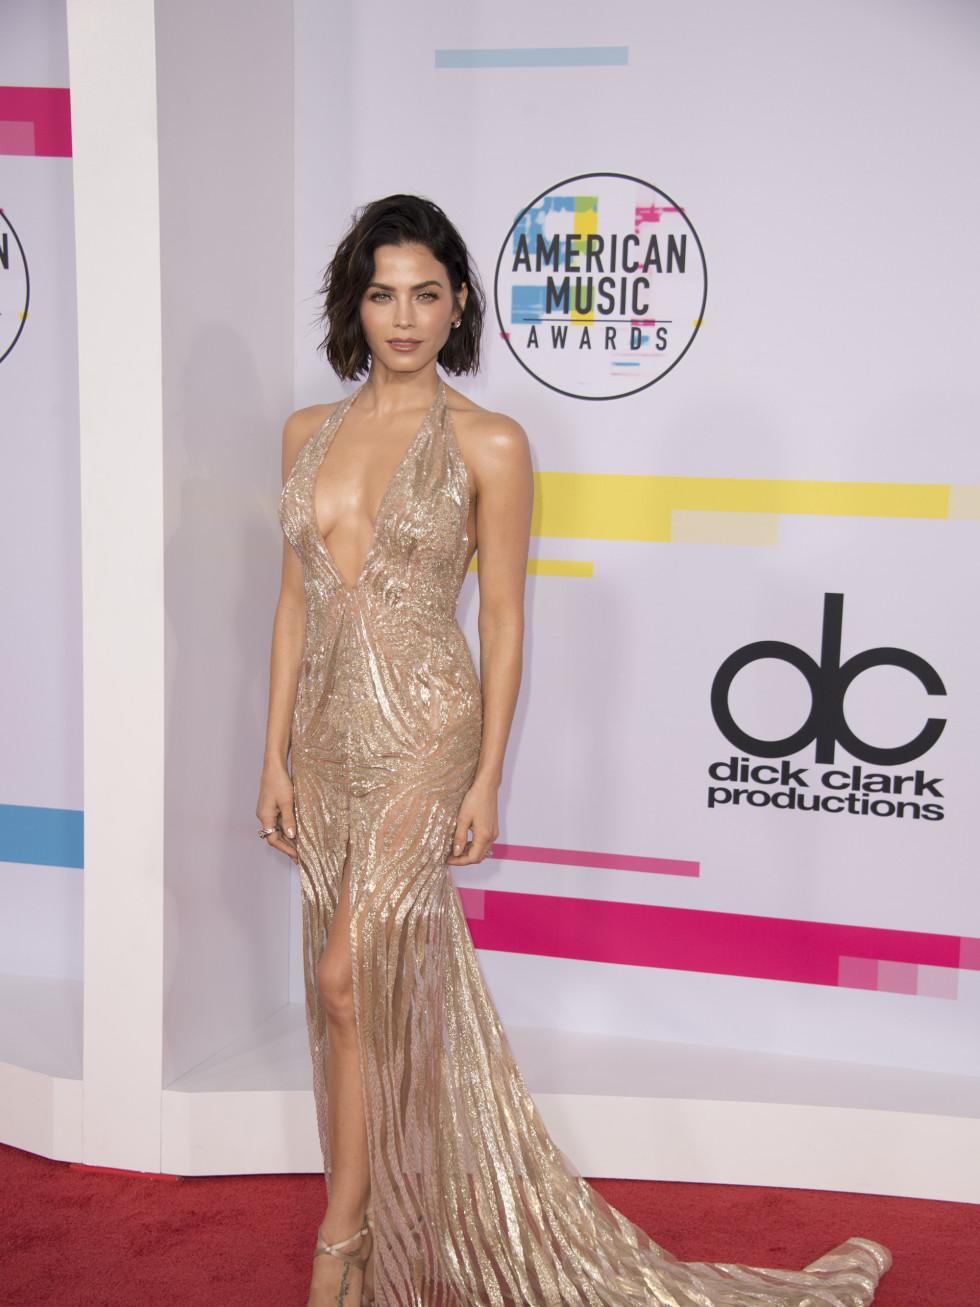 American Music Awards Jenna Dewan-Tatum